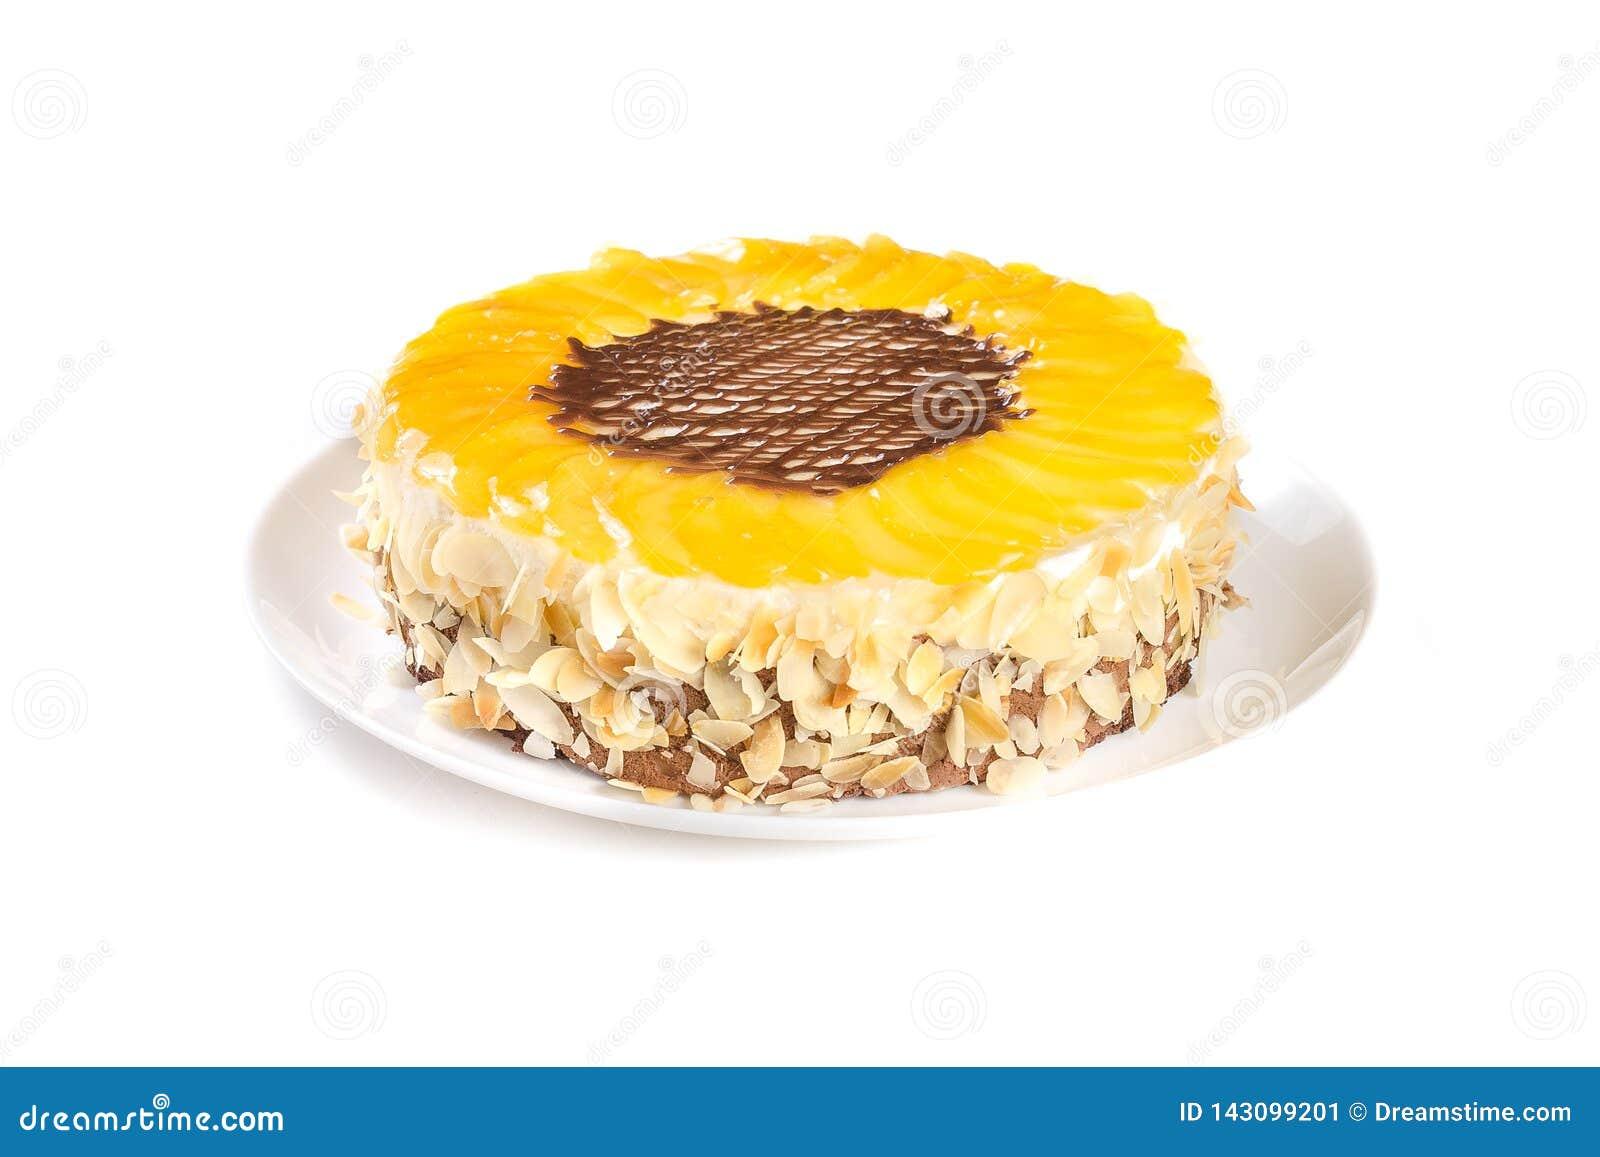 Peach cake isolated on white background